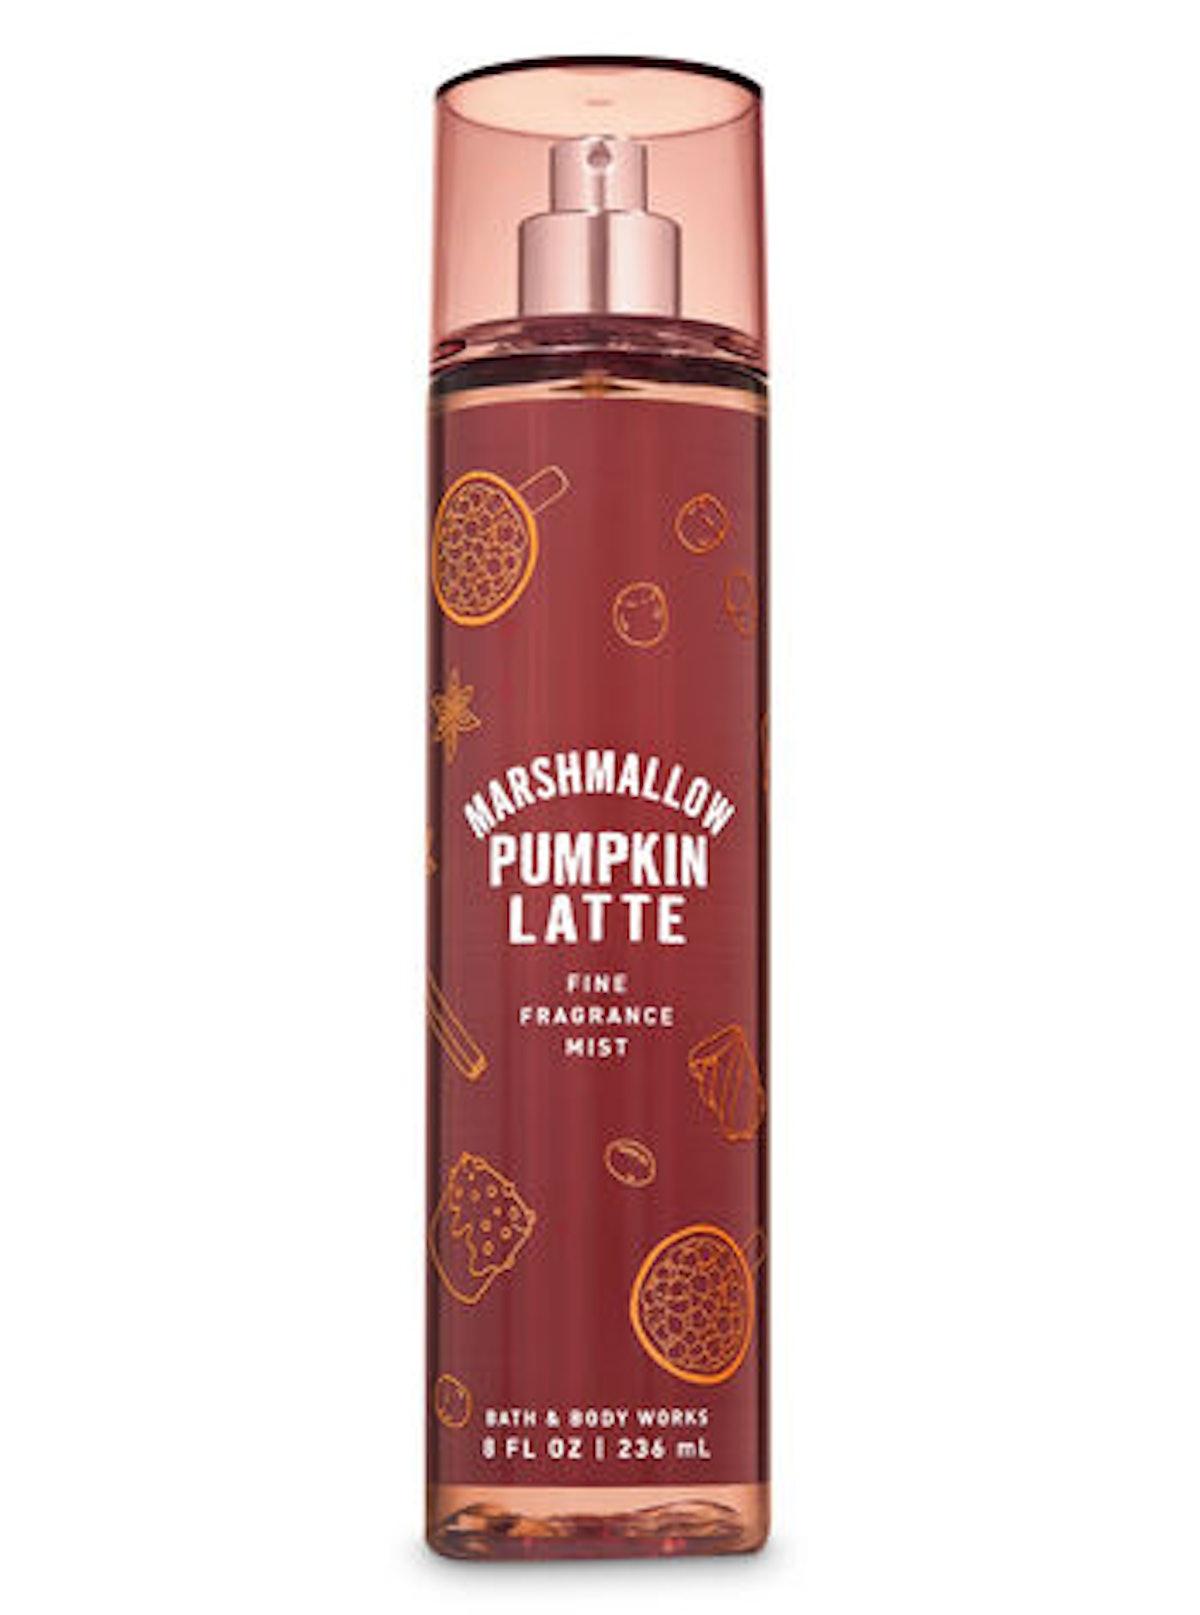 Marshmallow Pumpkin Latte Fine Fragrance Mist